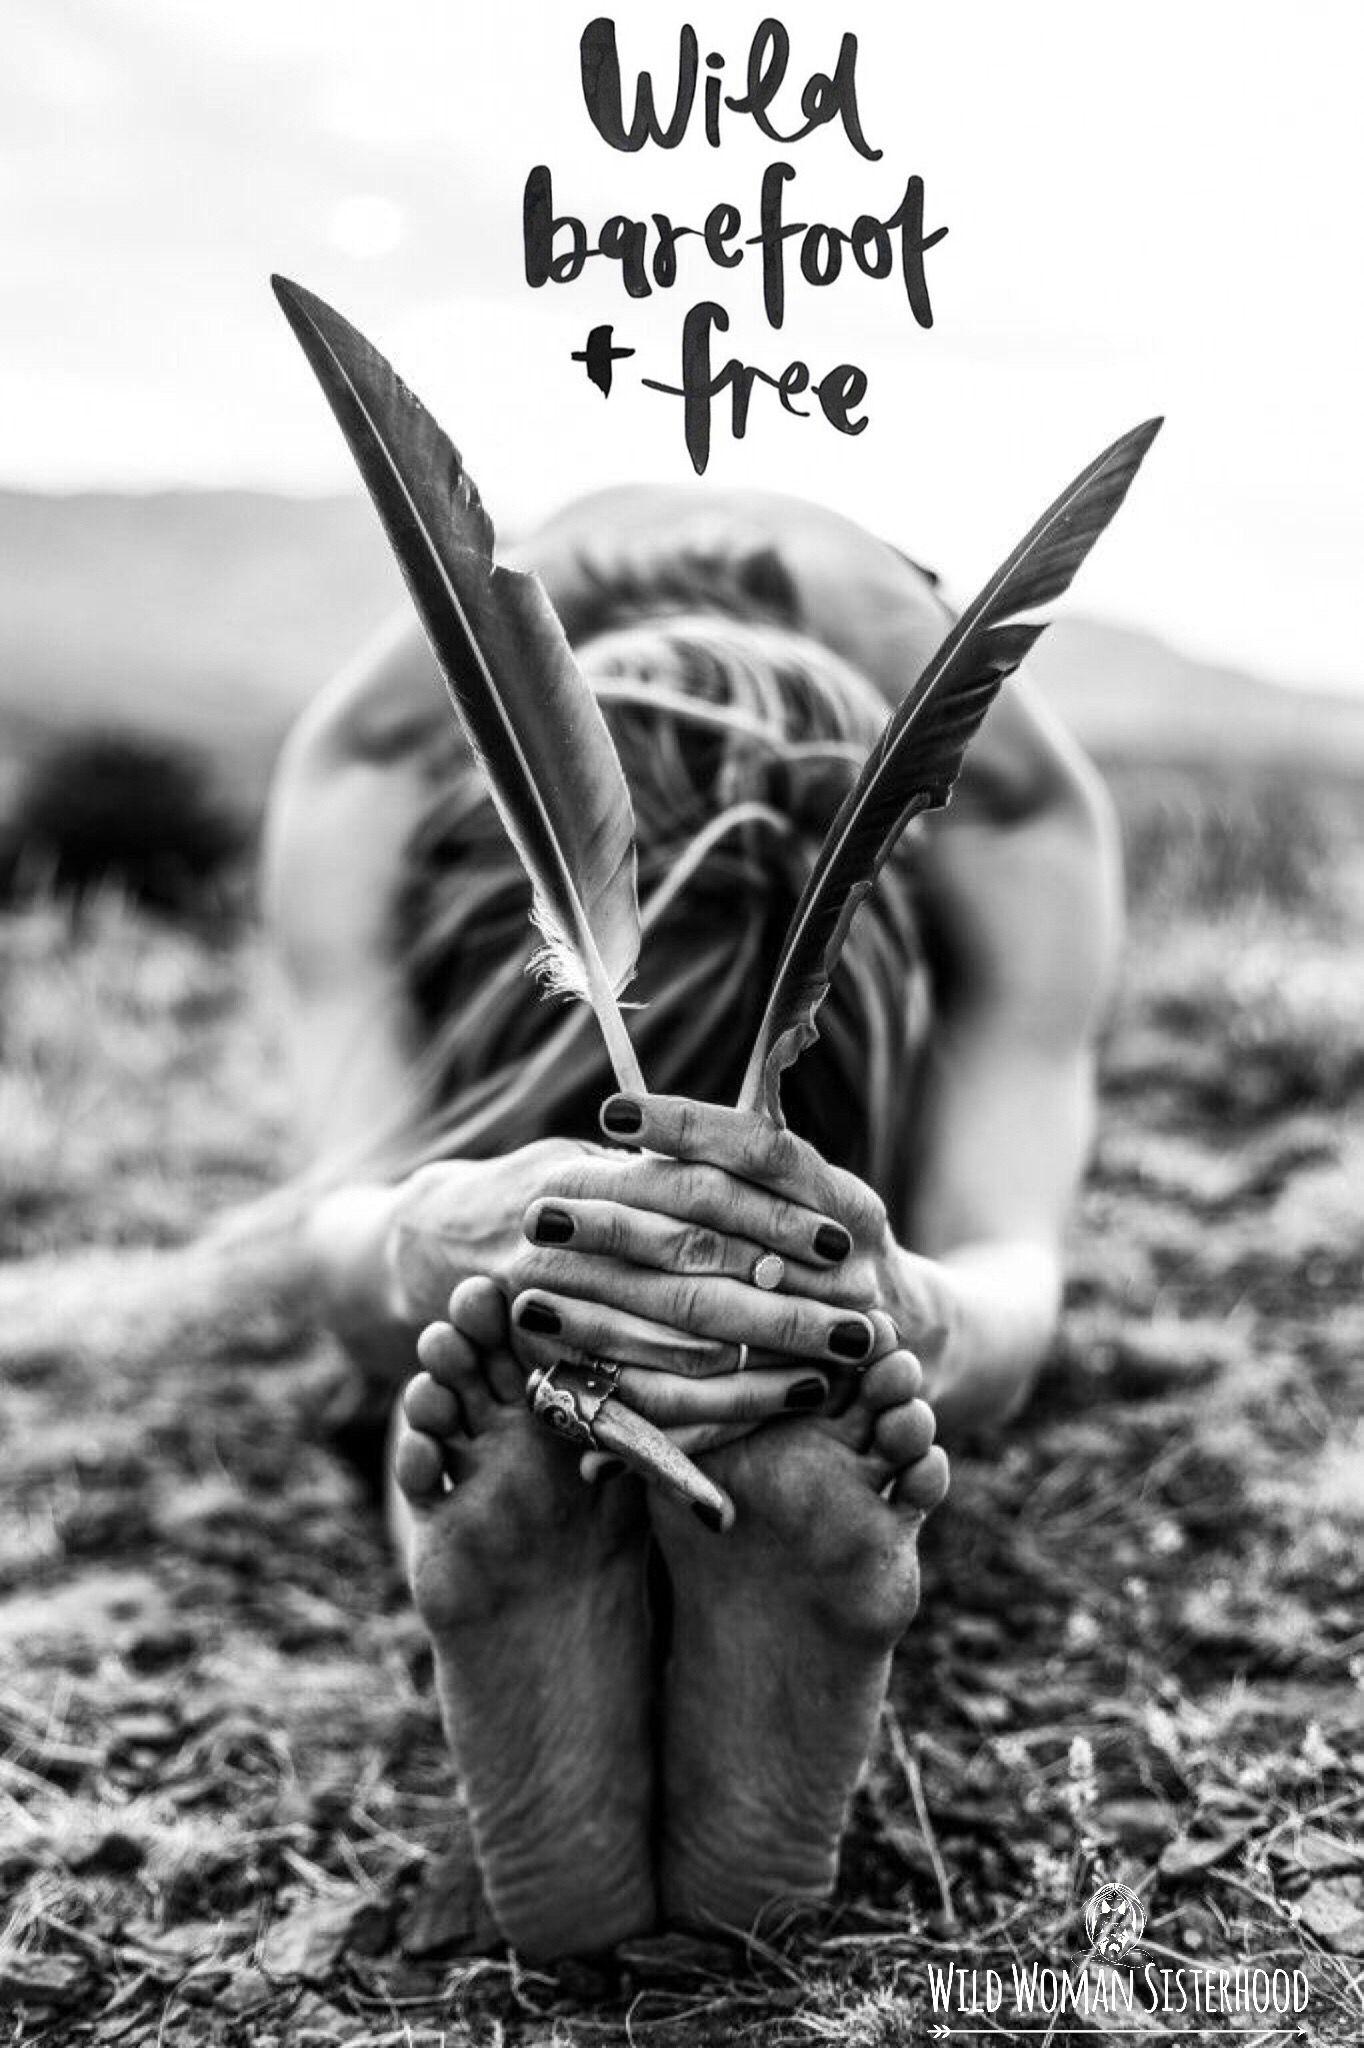 Barefoot Wild Woman Sisterhood